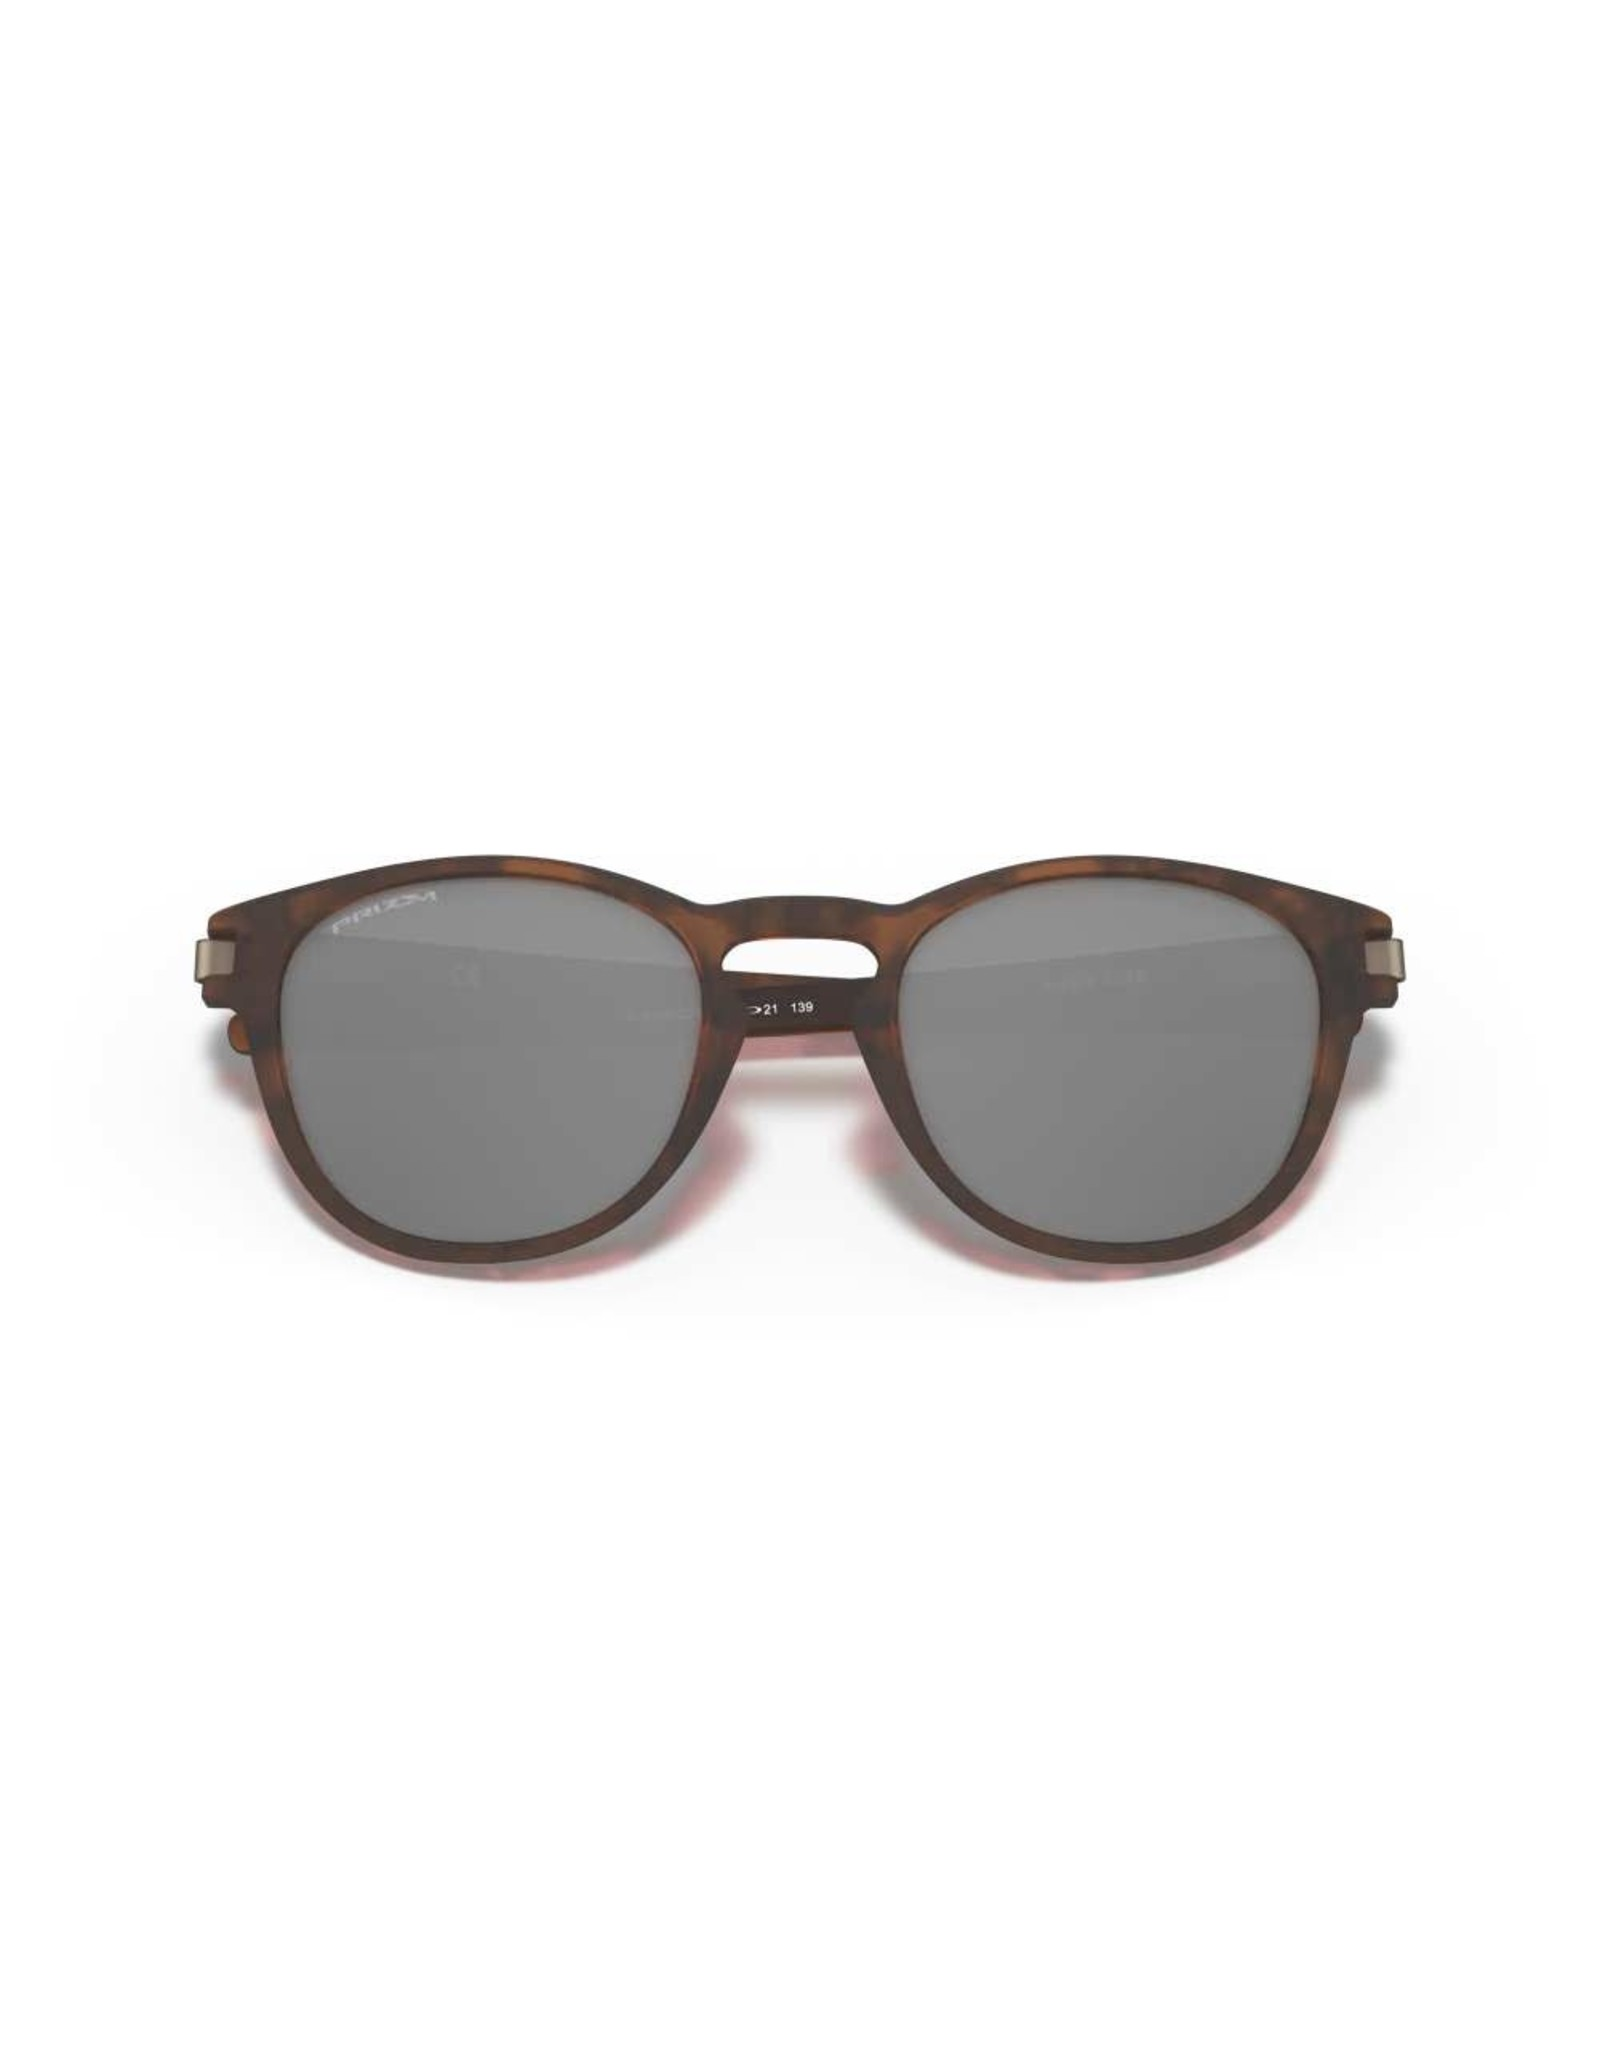 OAKLEY Oakley Latch matte brown tortoise w prizm iridium Blk Sunglasses